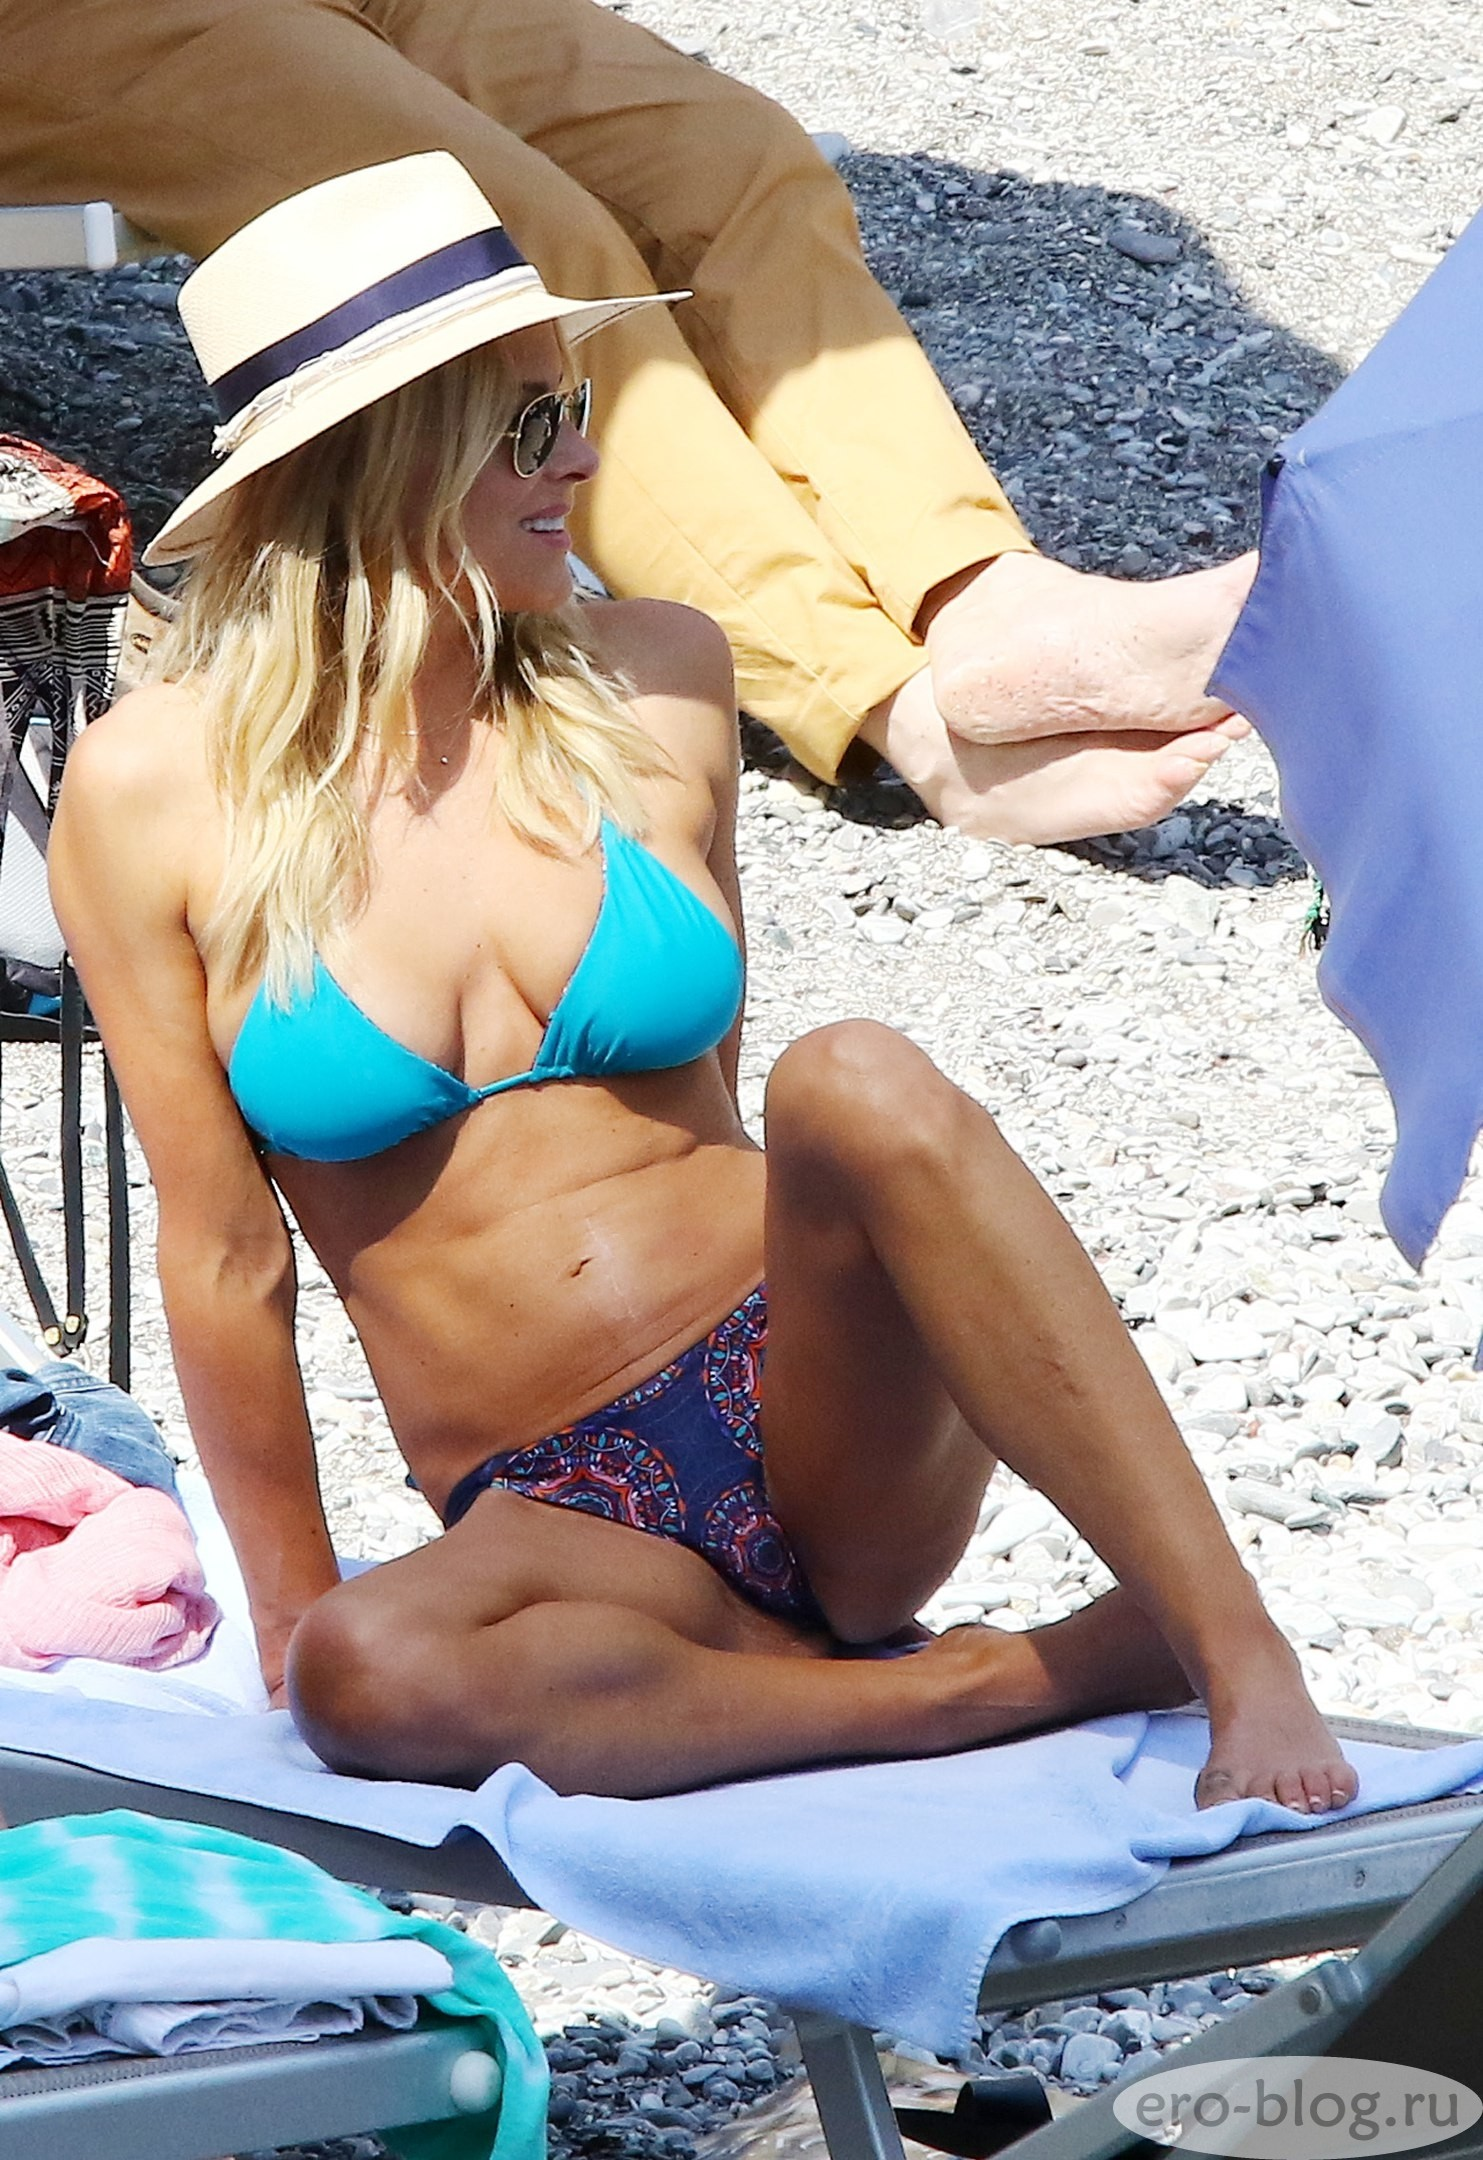 Голая обнаженная Brittany Daniel | Бриттани Дэниел интимные фото звезды